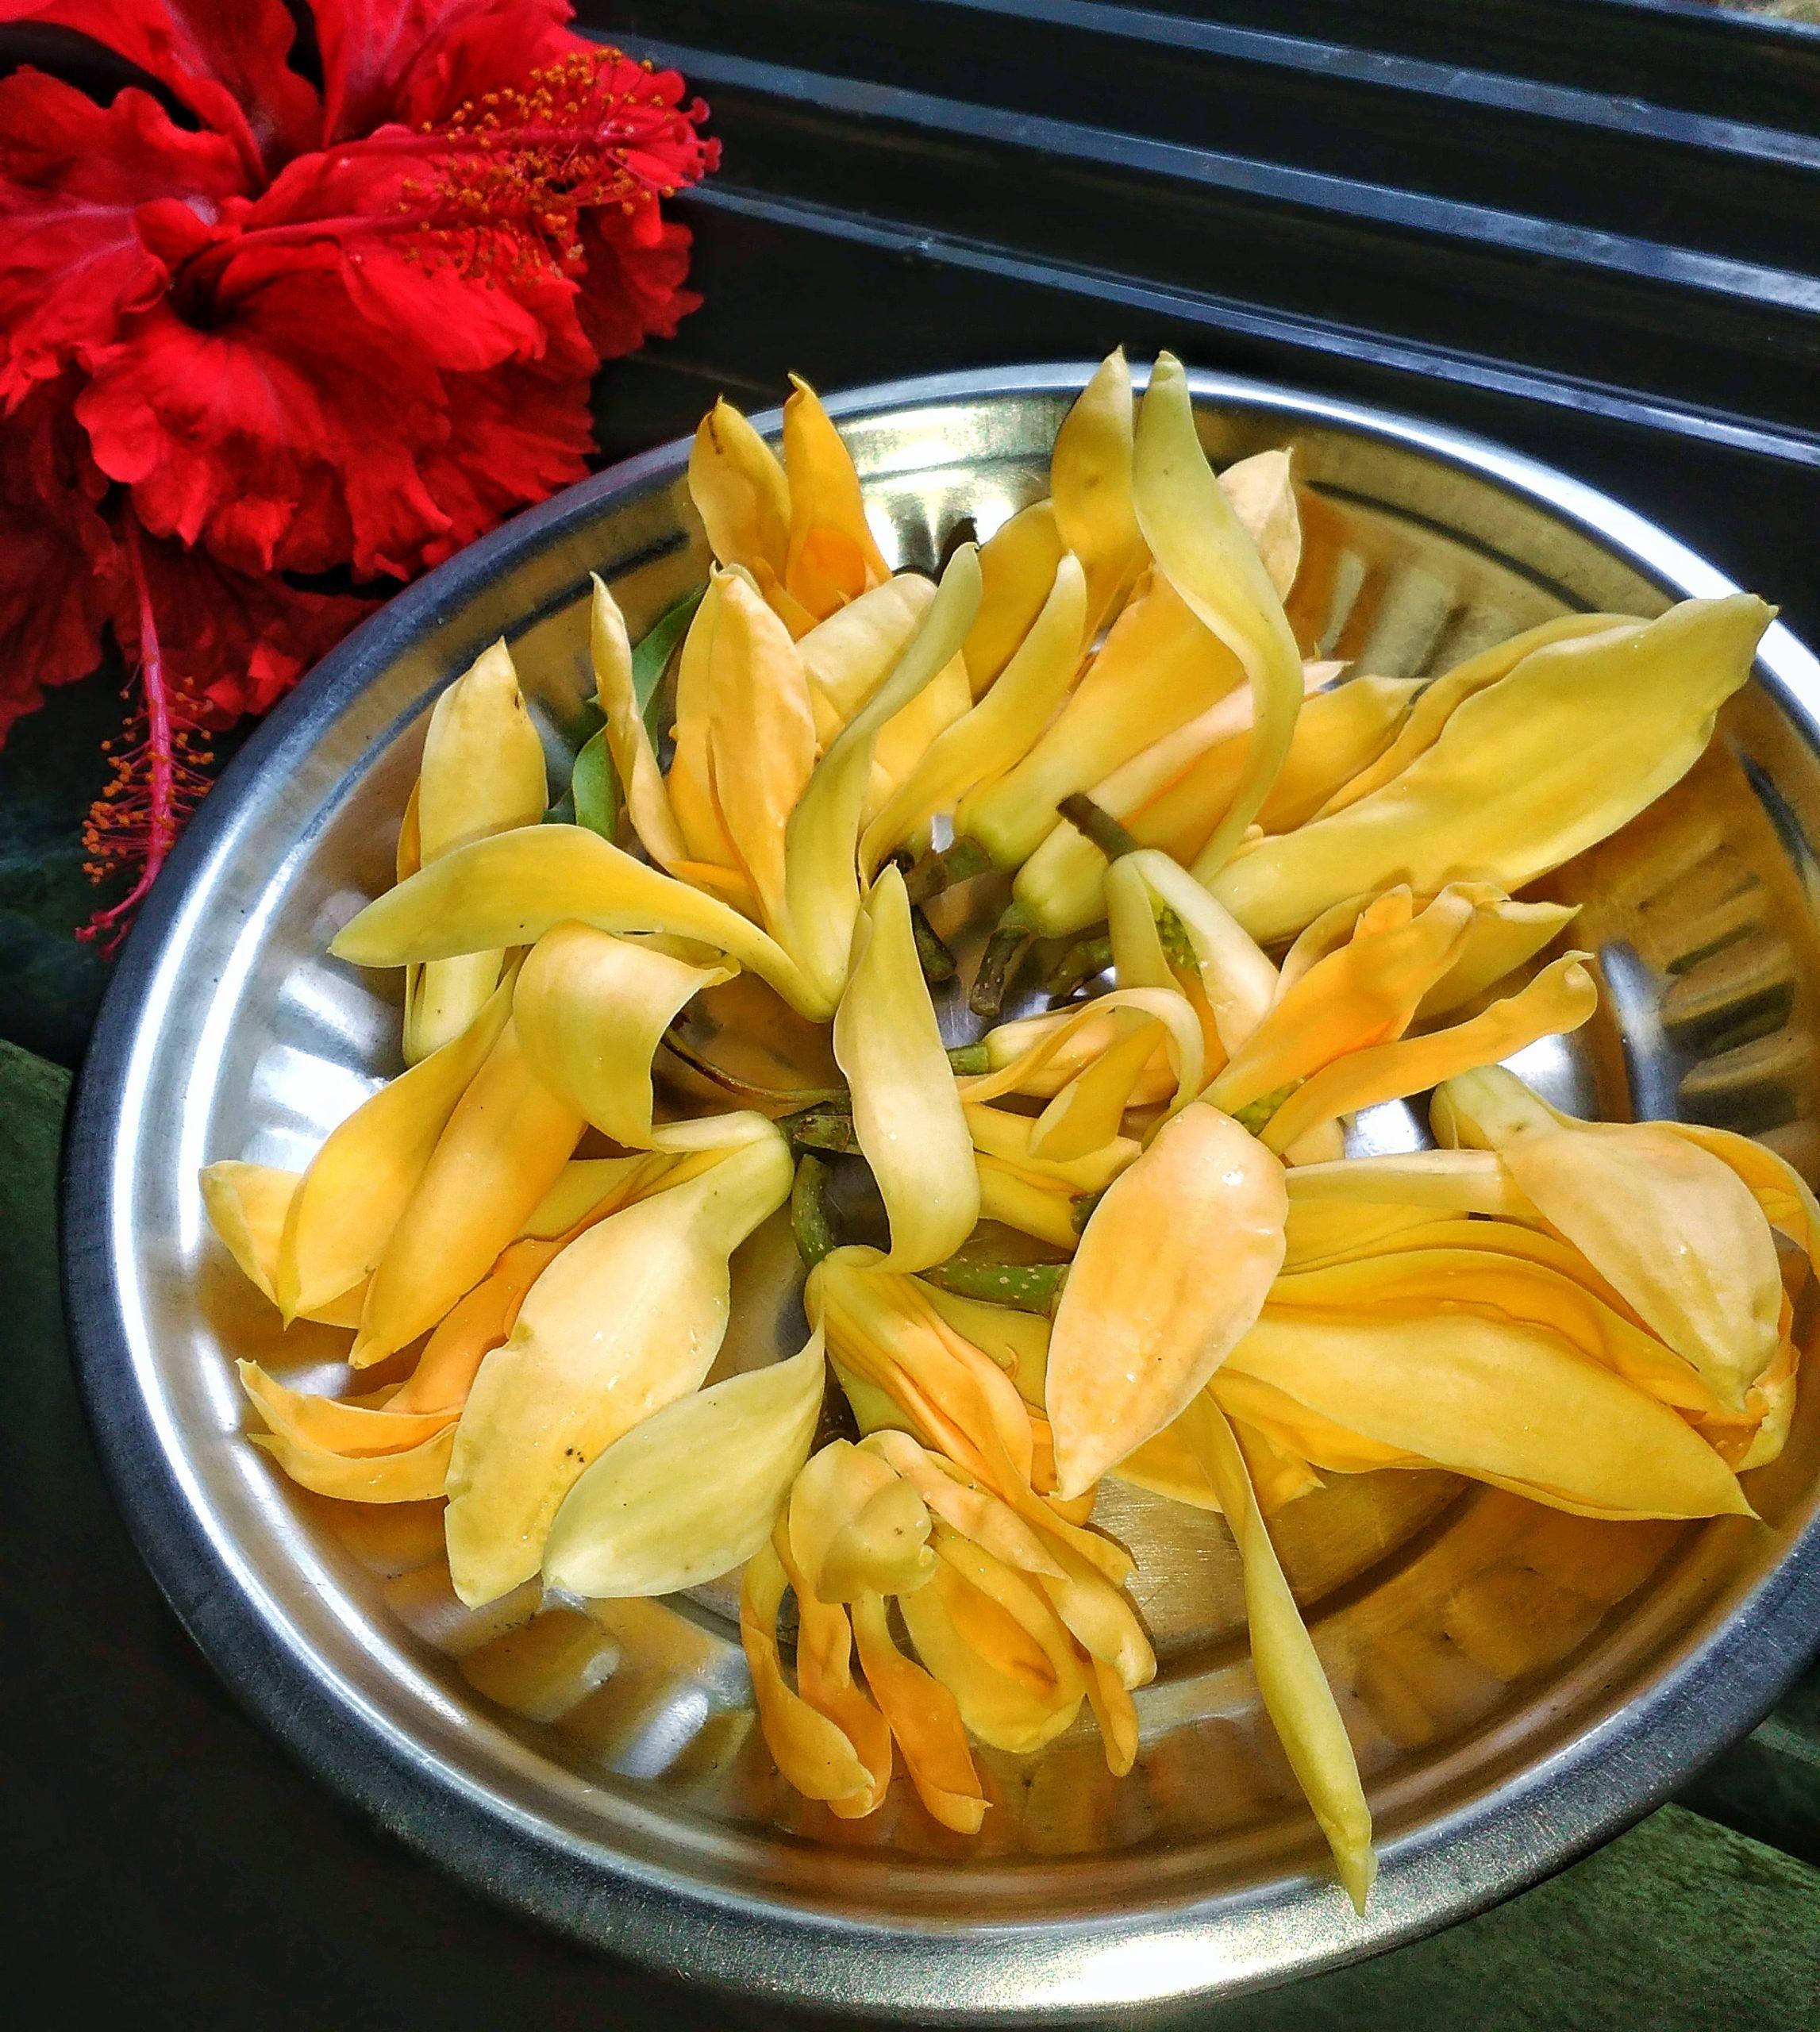 Frangipani plant flower